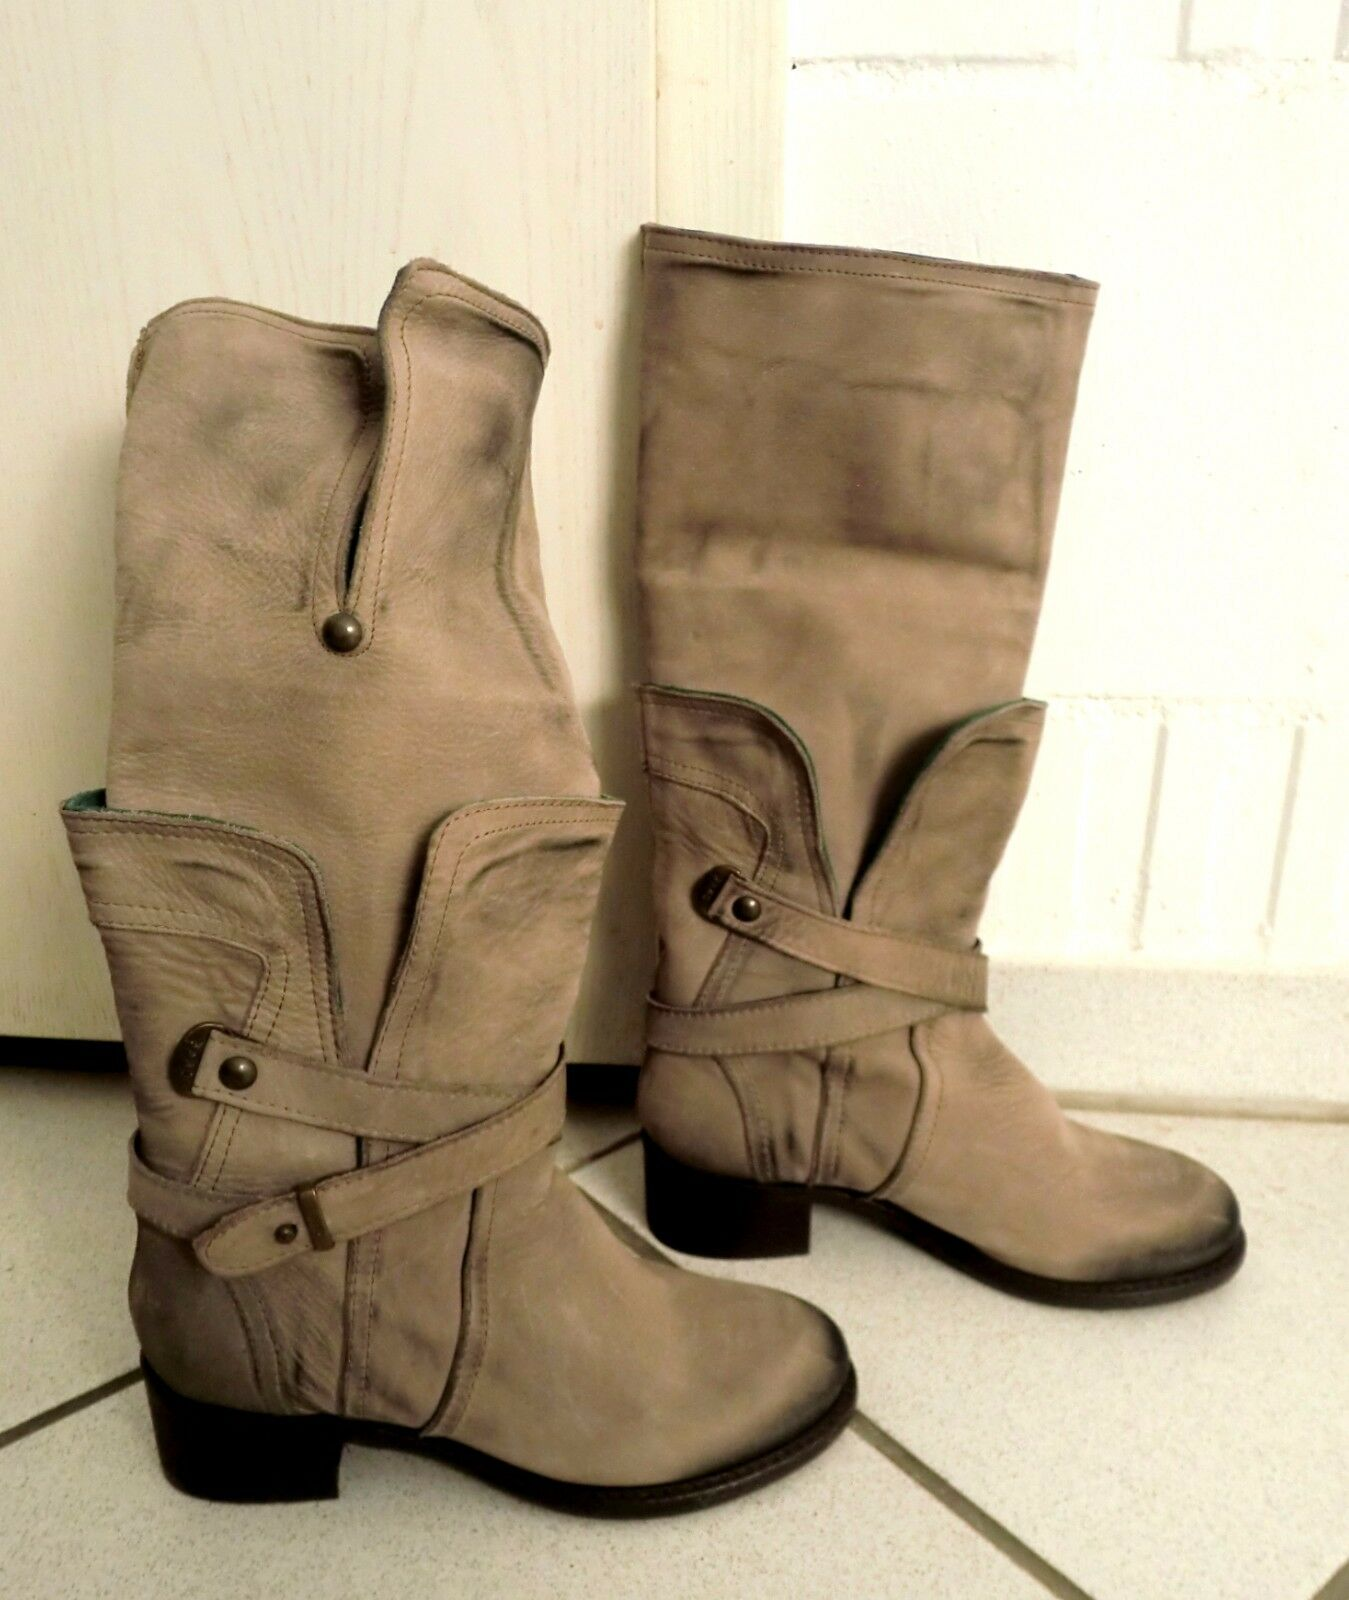 Ovyé Stiefel - Damen - Stiefel - Made Made Made in  - Lederschuhe - NEU 9098ac